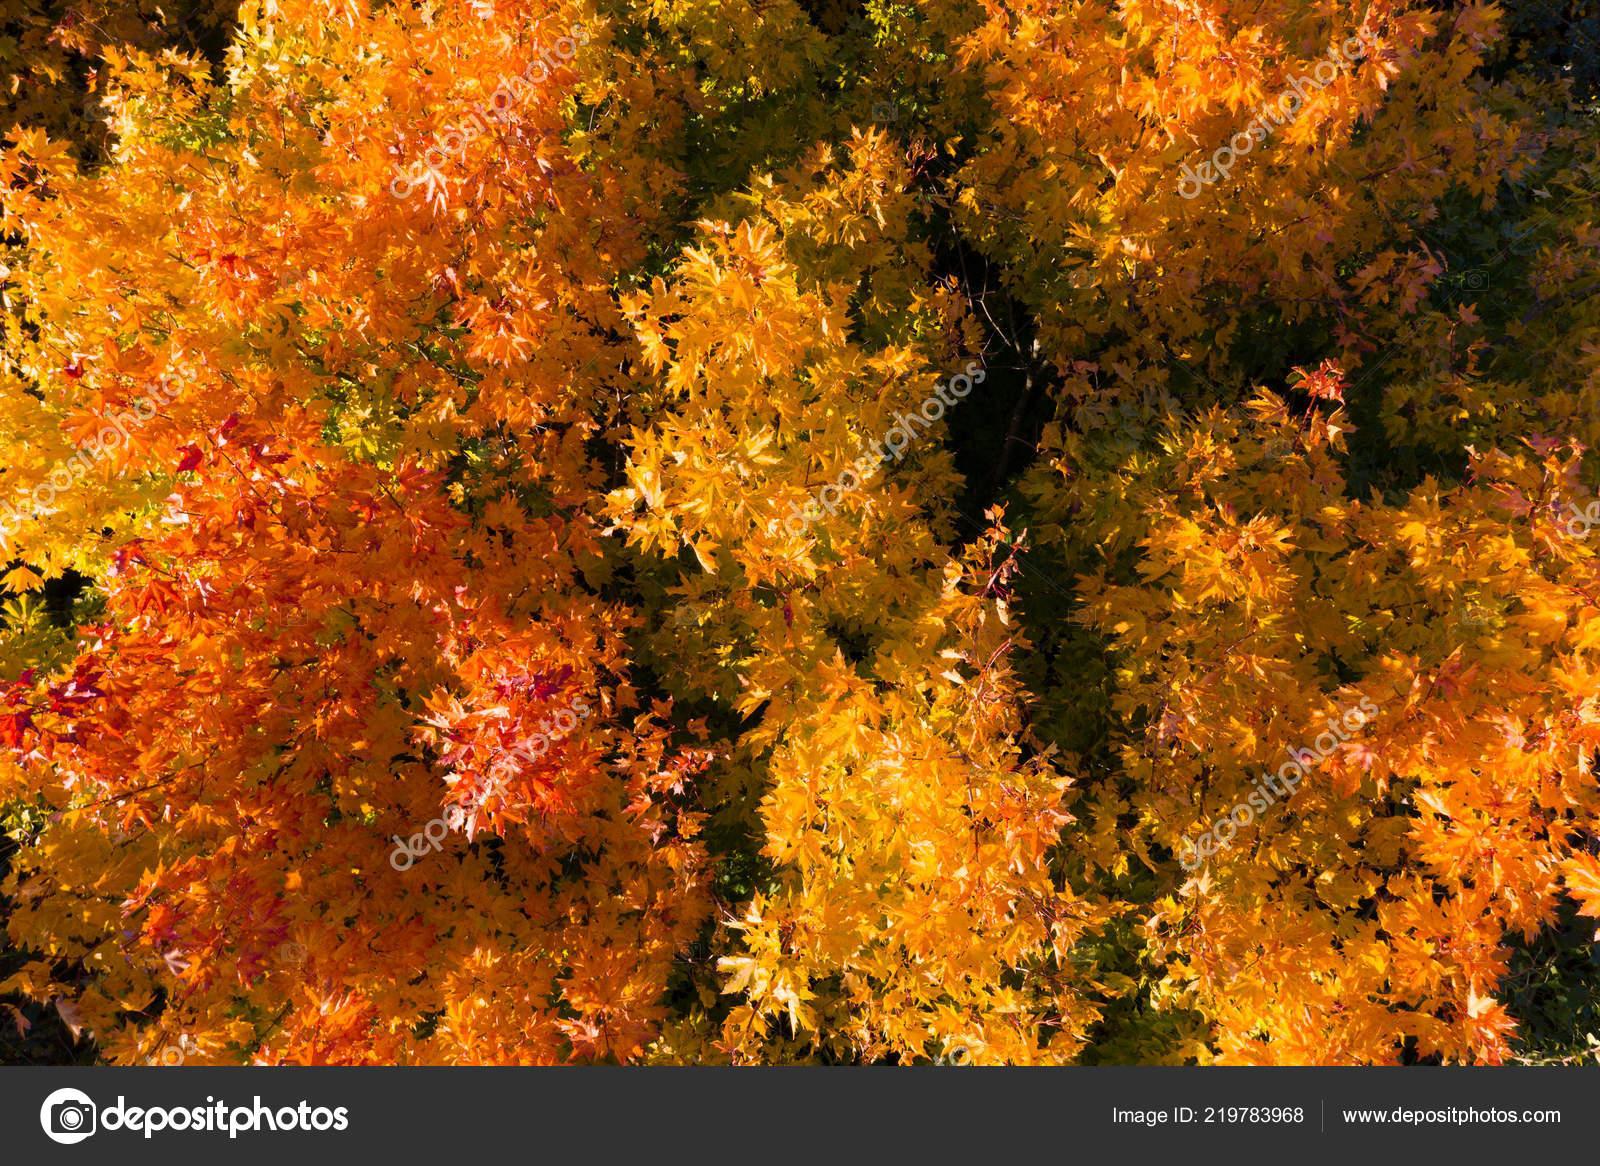 Fall Trees Desktop Wallpaper Autumn Tree Red Yellow Maple